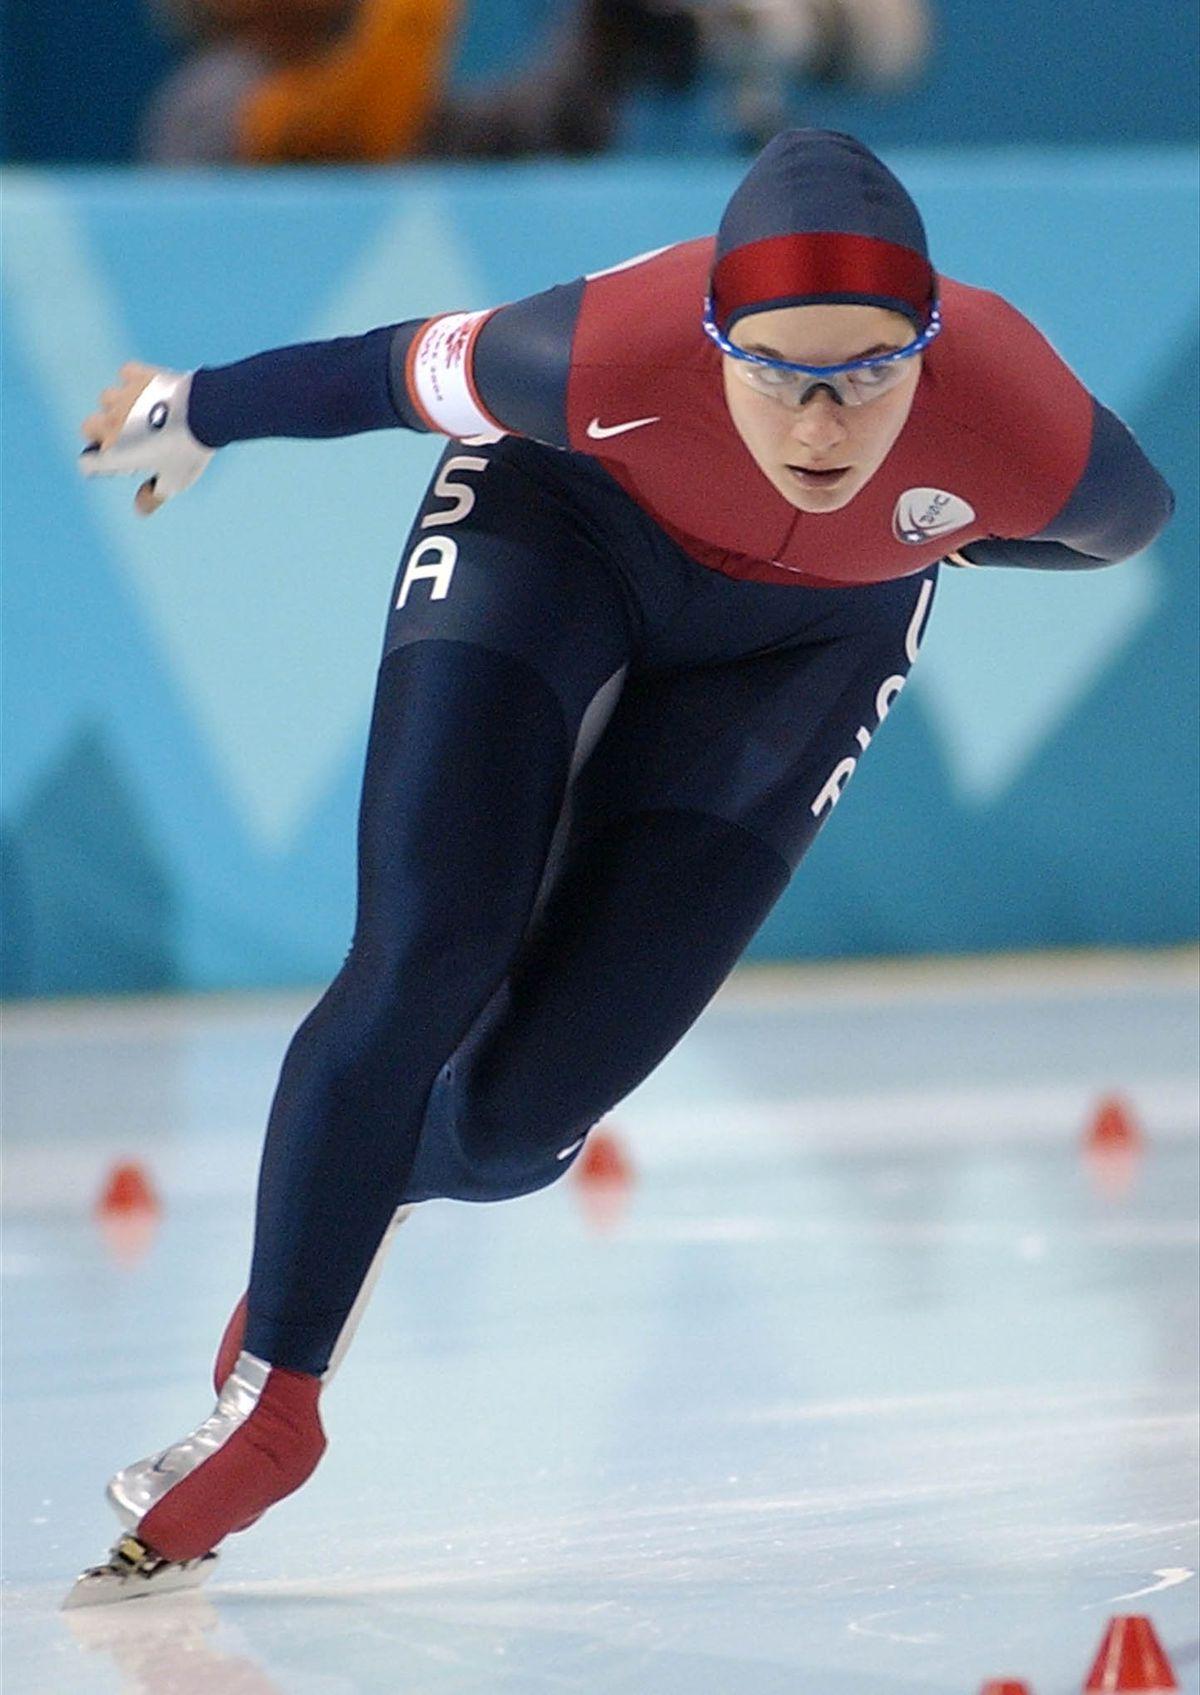 USA's Catherine Raney skates in the women's 3000 meters, Salt Lake City 2002 Winter Olympics. February 10, 2002.